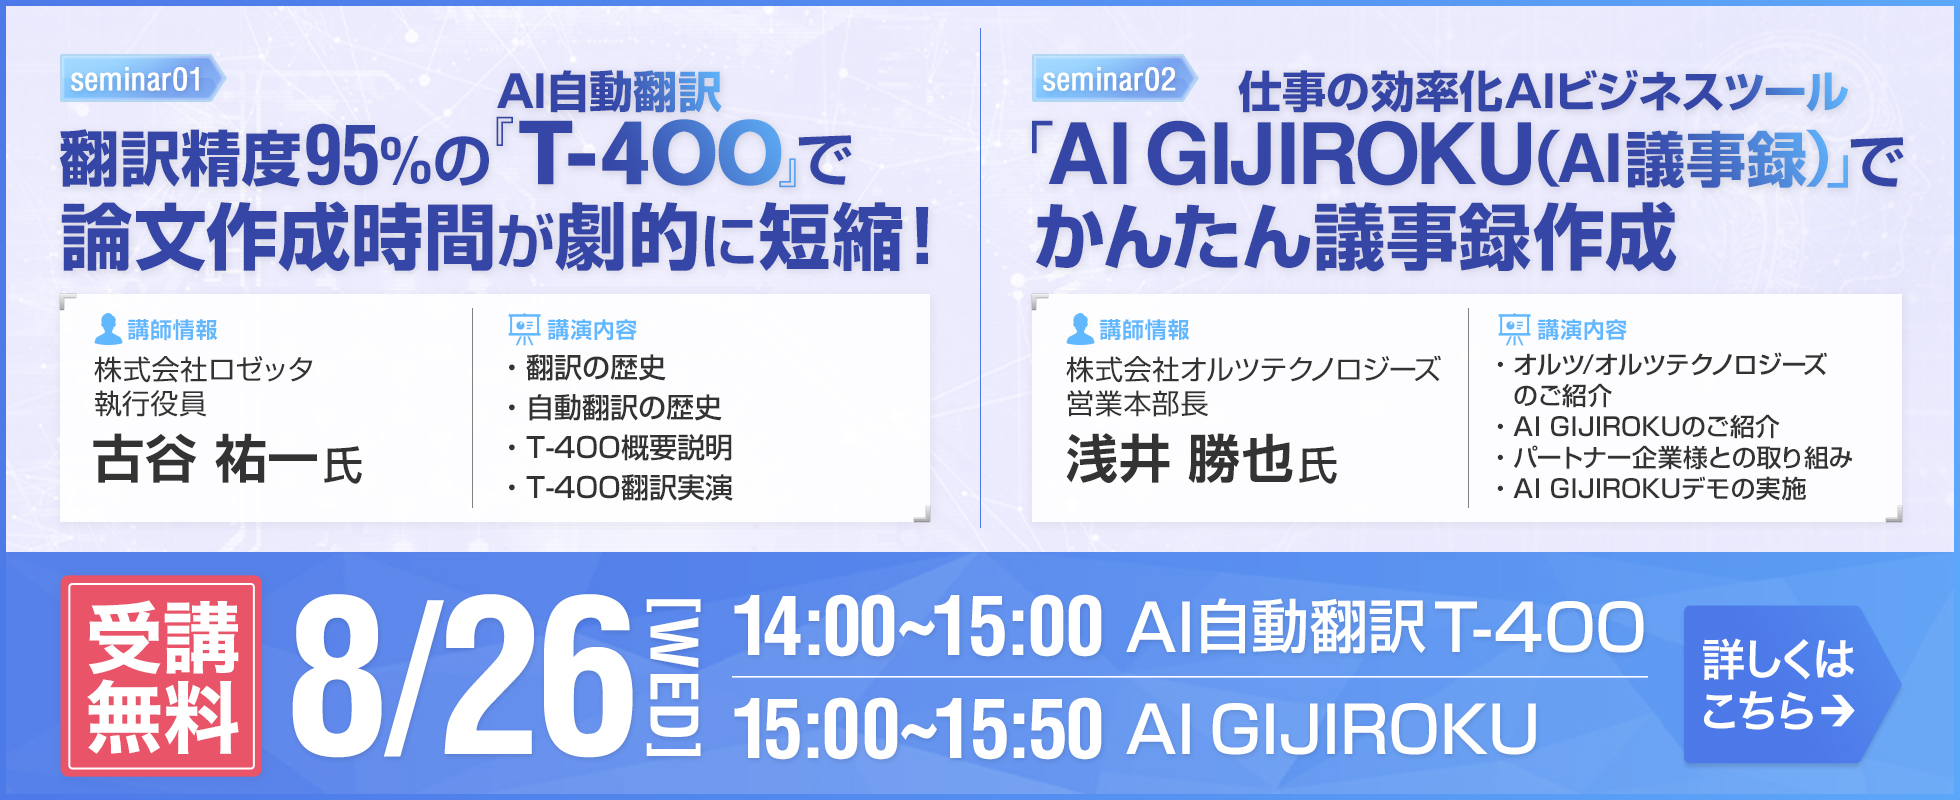 AI自動翻訳『T-4OO』/かんたん議事録作成『AI GIJIROKU』 オンラインセミナー